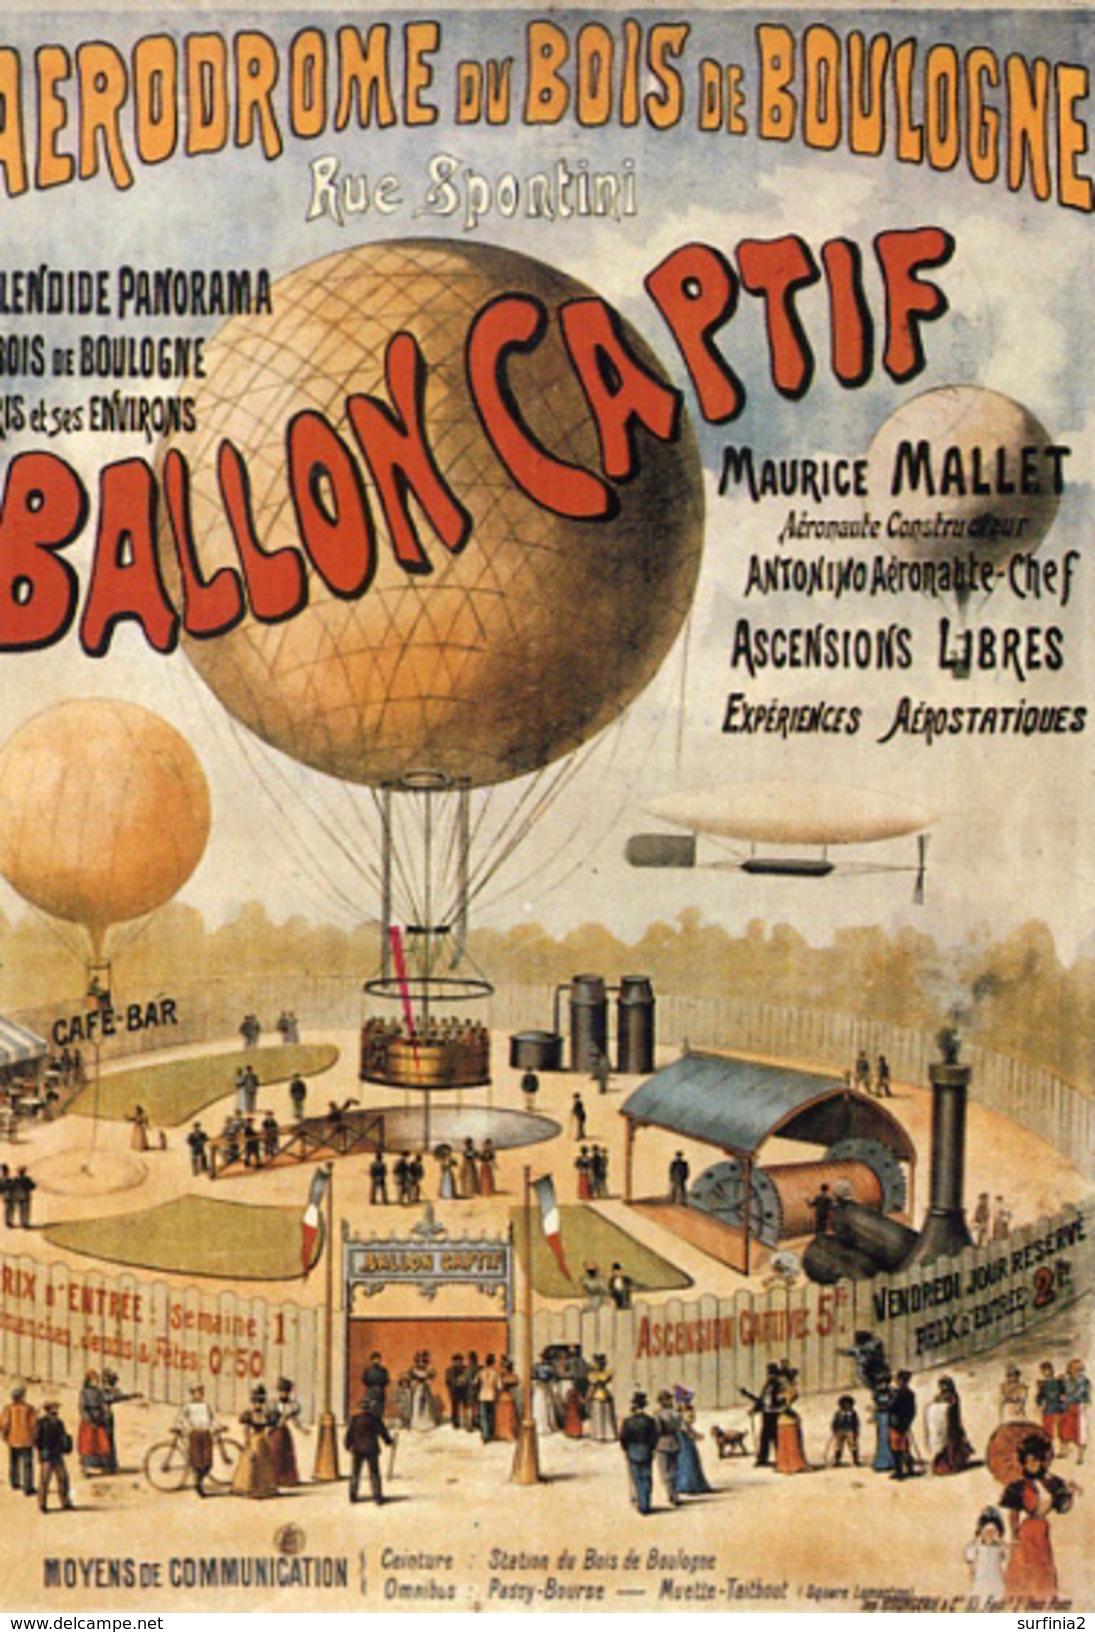 AERODROME DU BOIS DE BOULOGNE - BALLON CAPTIF - REPRO  M361 - Advertising